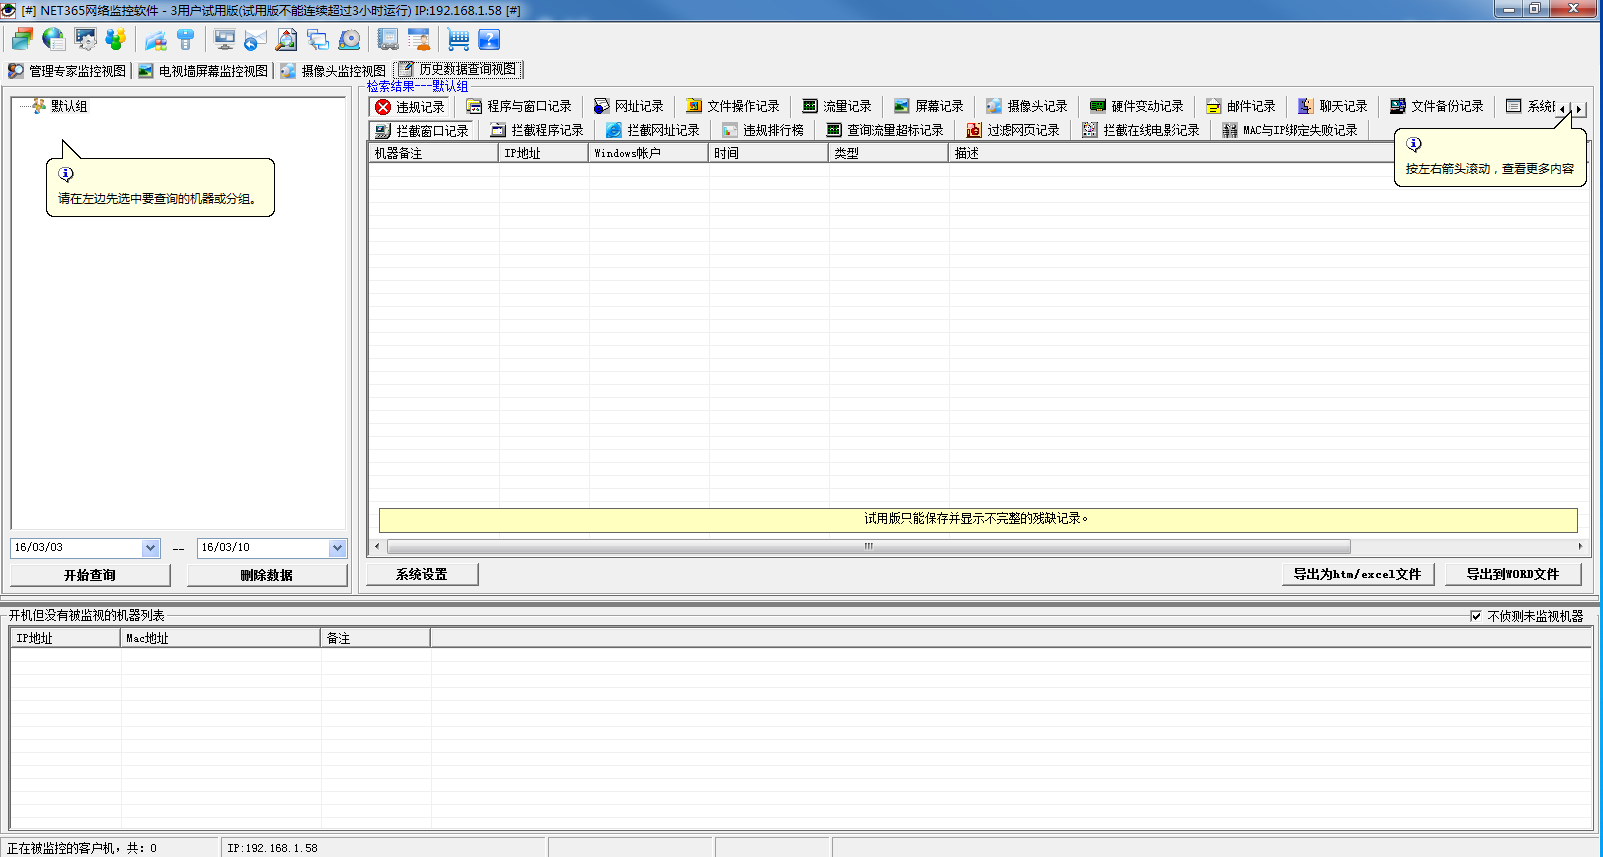 NET365网络监控软件截图3